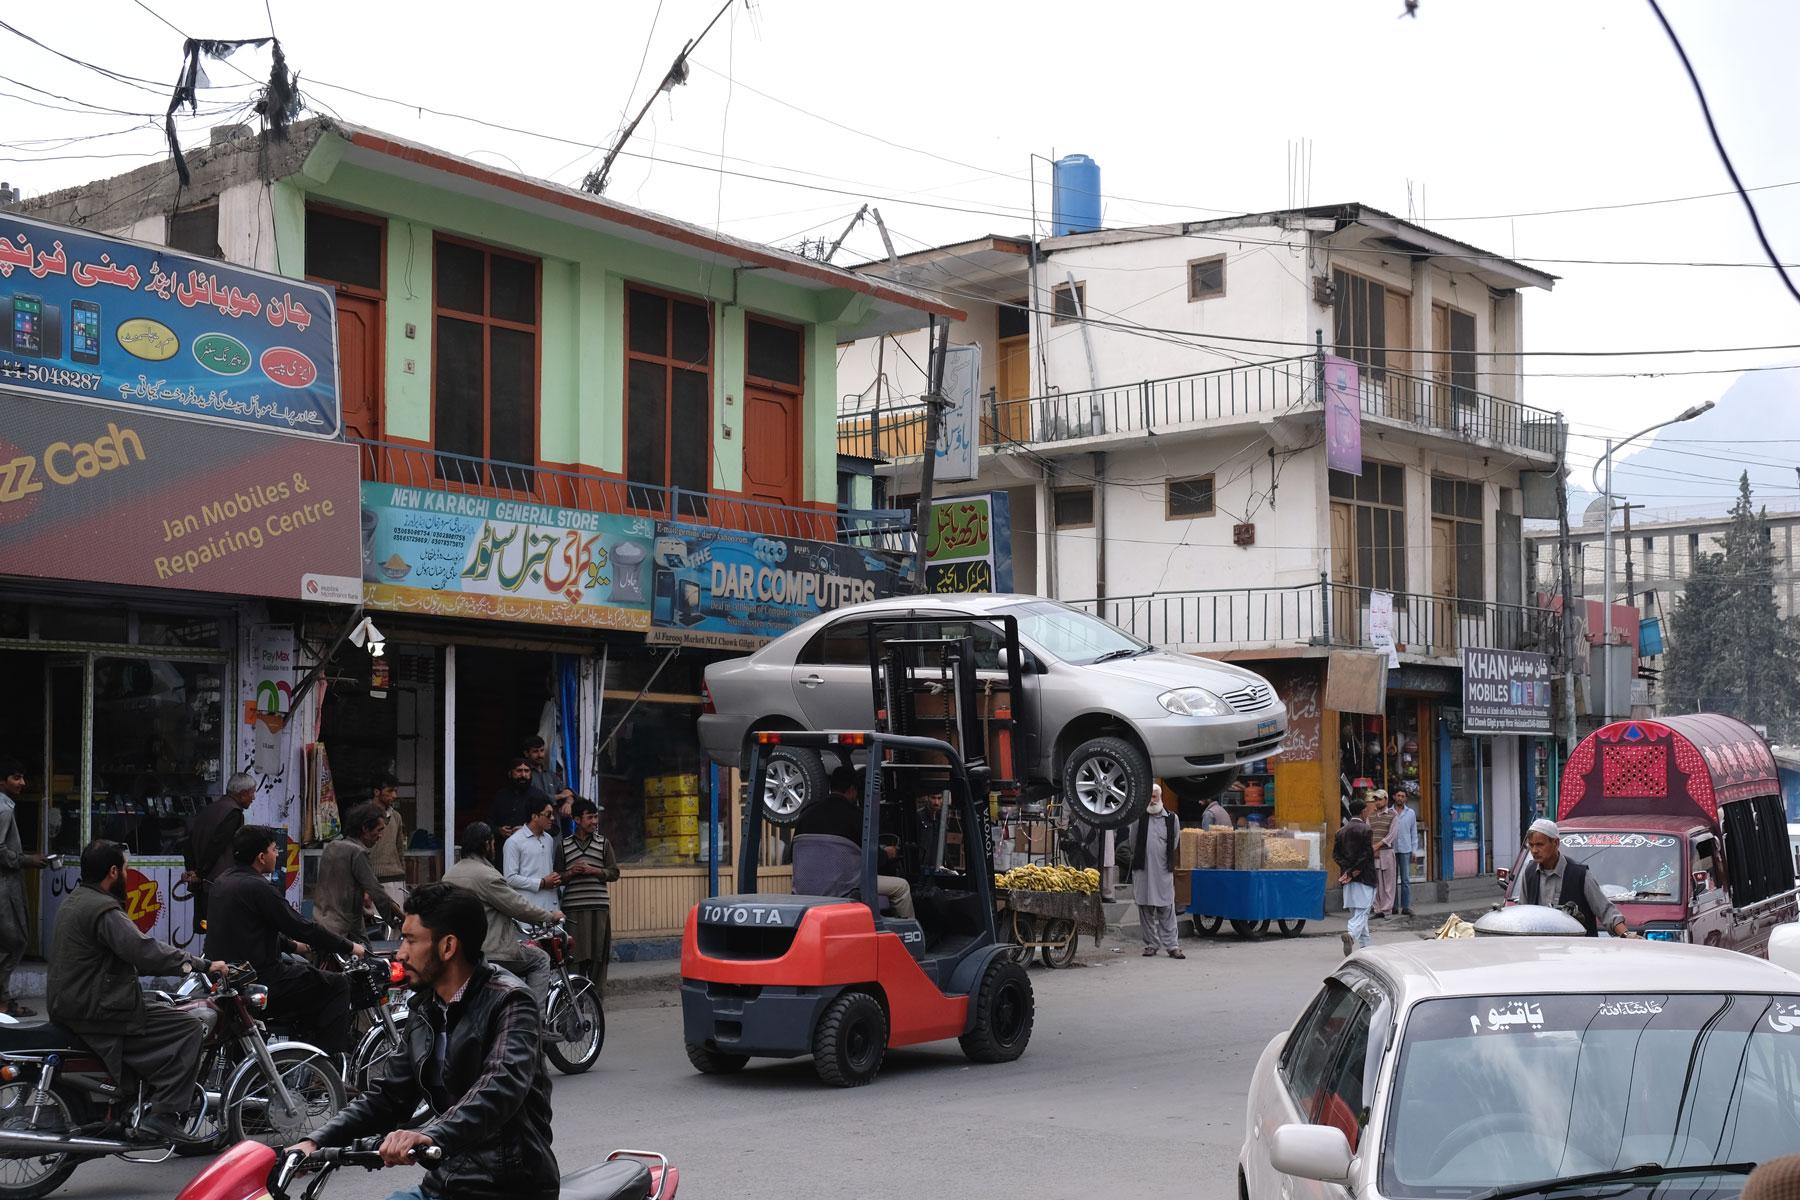 Autoabschleppen in Gilgit